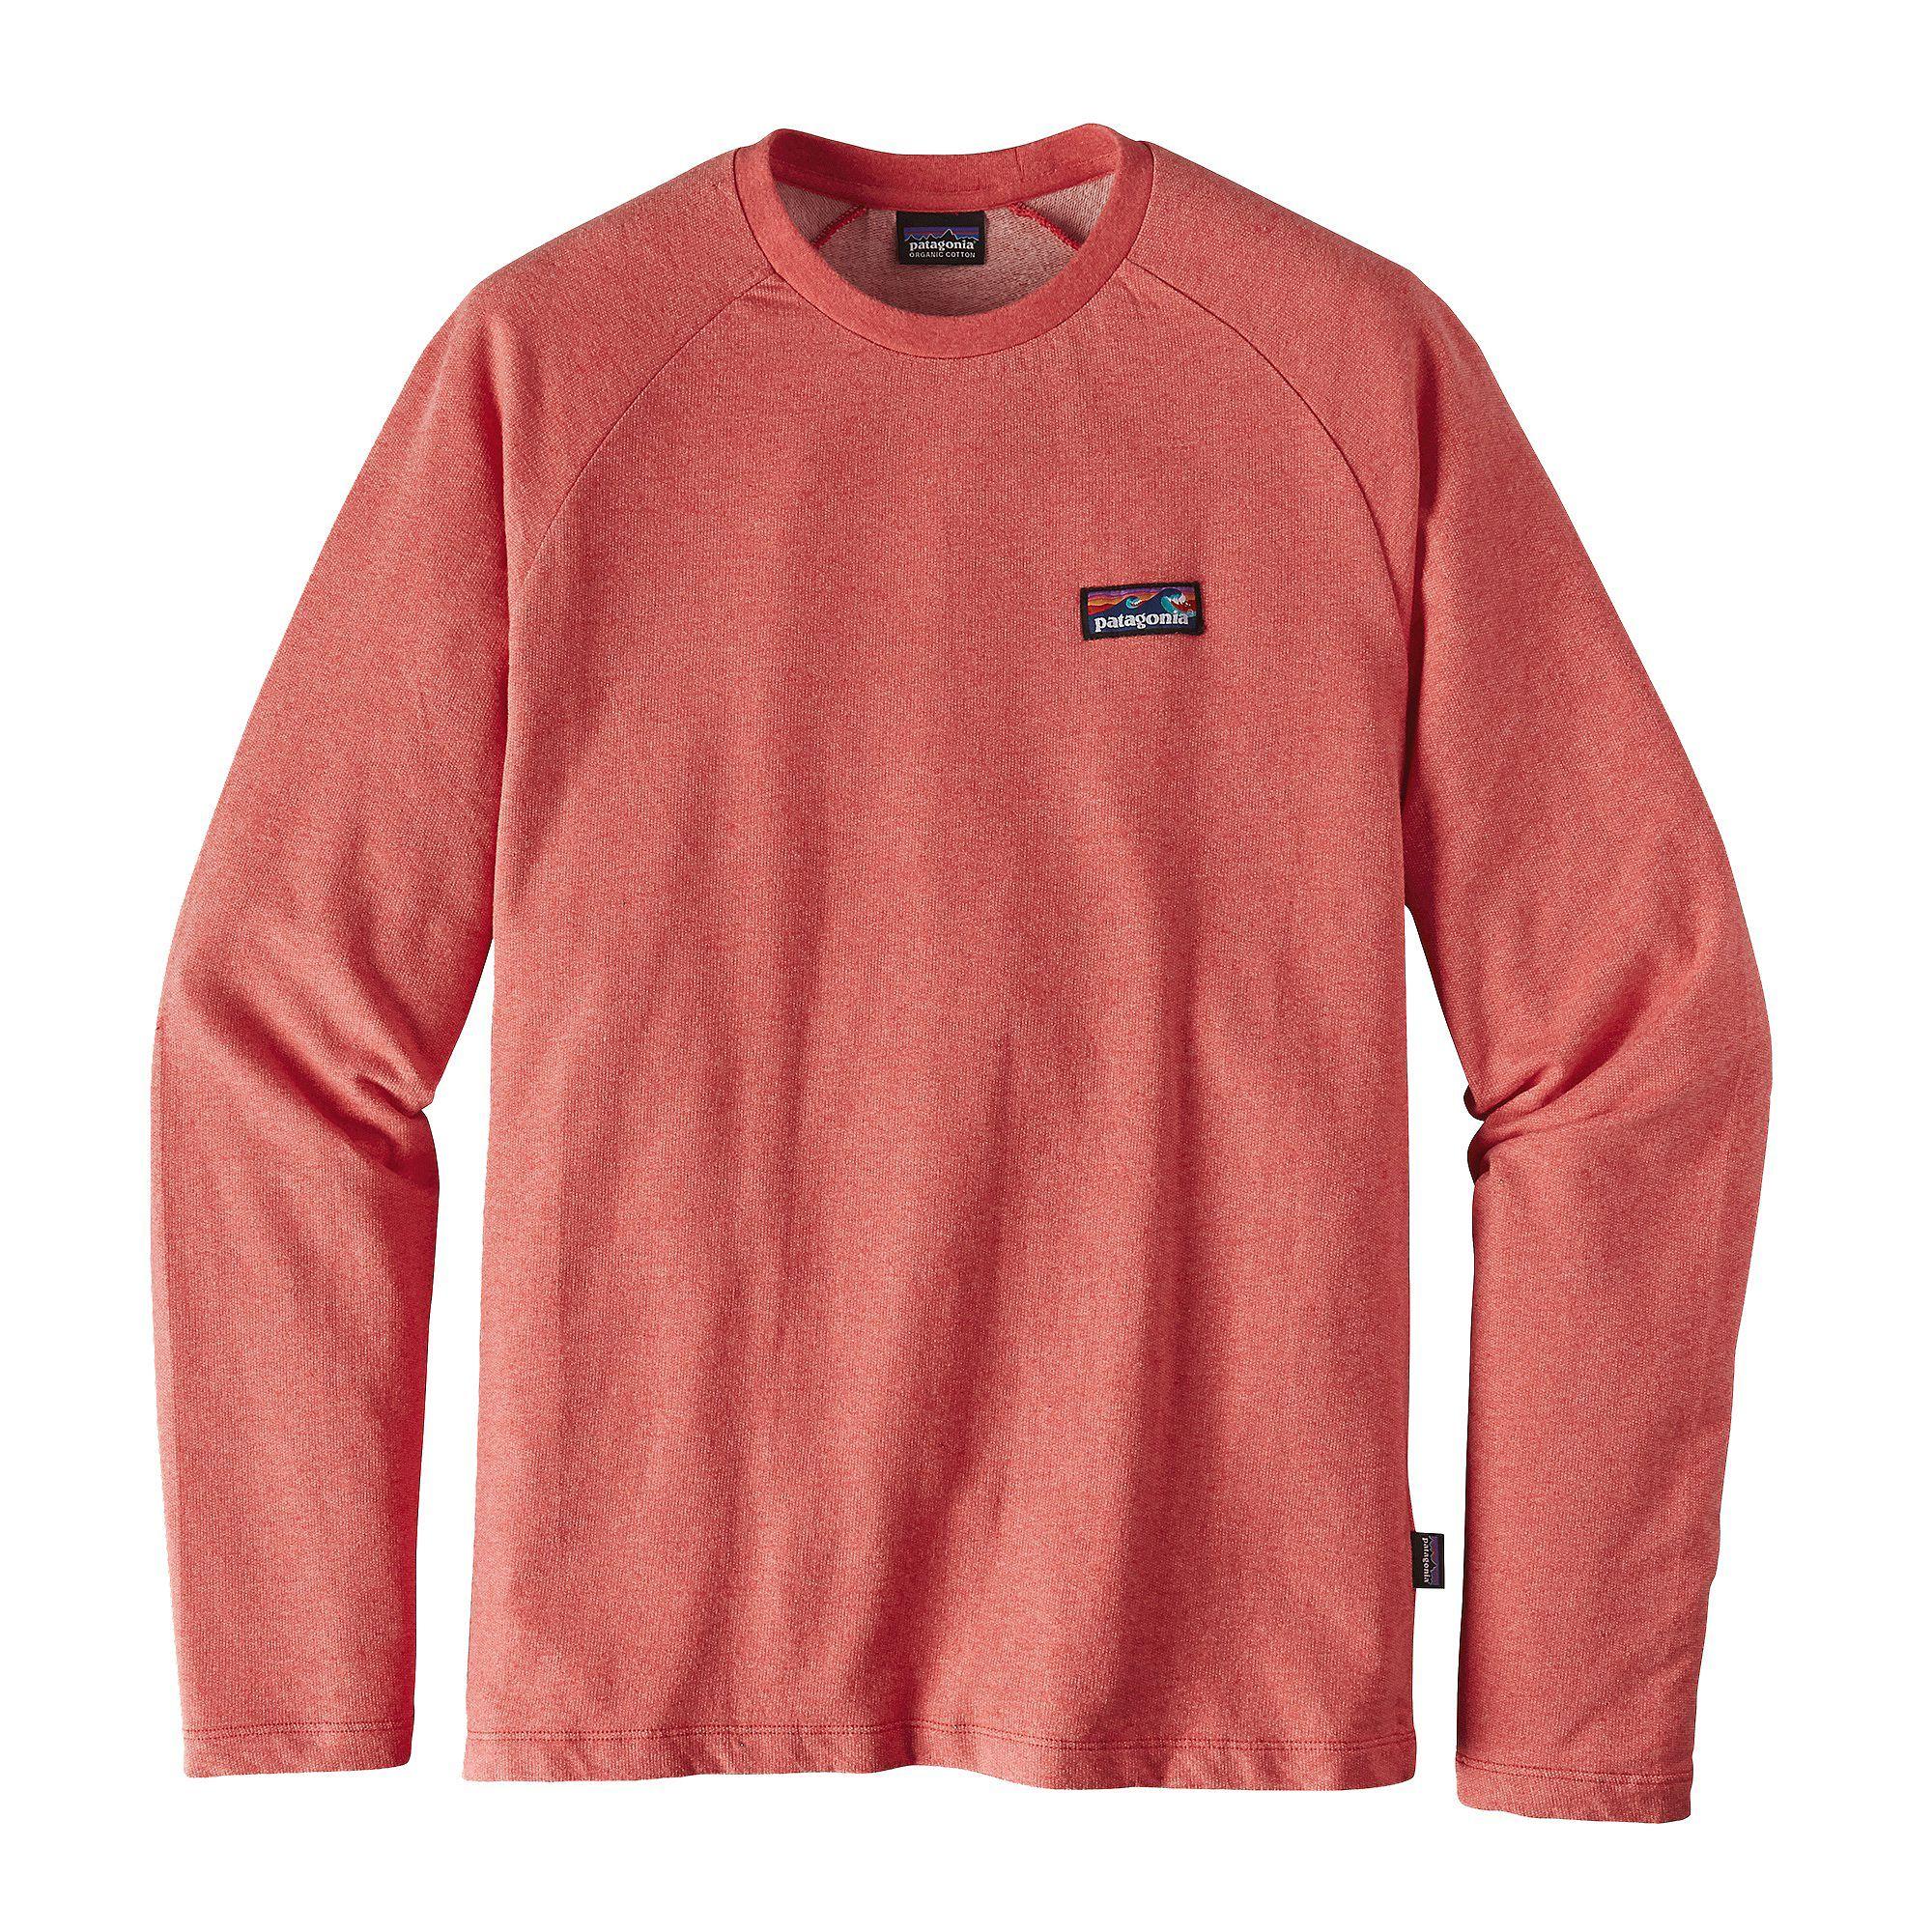 Patagonia Men S Board Short Label Lw Crew Sweatshirt Mens Sweatshirts Long Sleeve Tshirt Men Mens Outdoor Clothing [ 2000 x 2000 Pixel ]